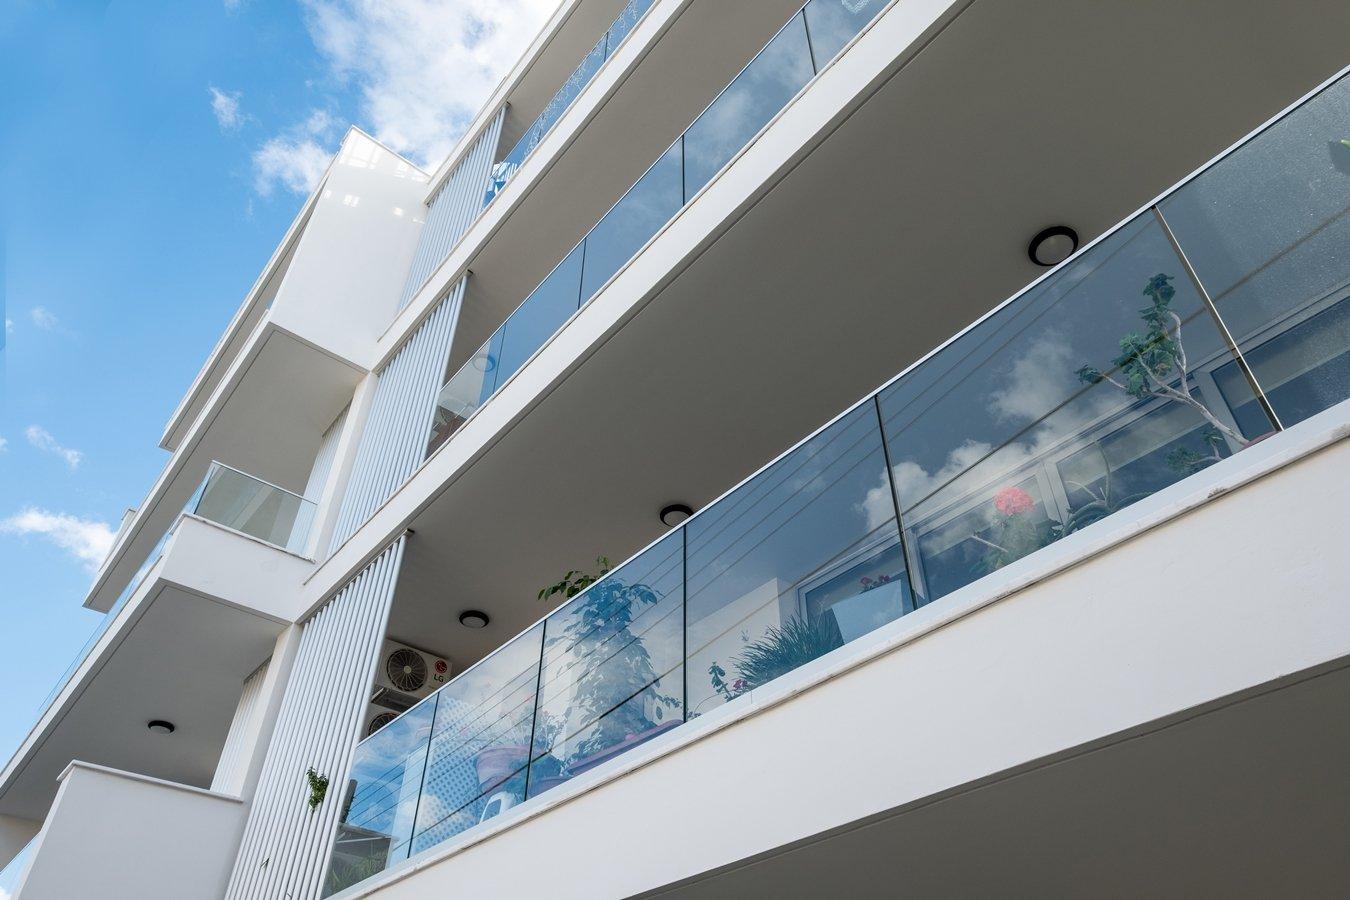 Orfeas-Apartment-301-DSCF7057_ed